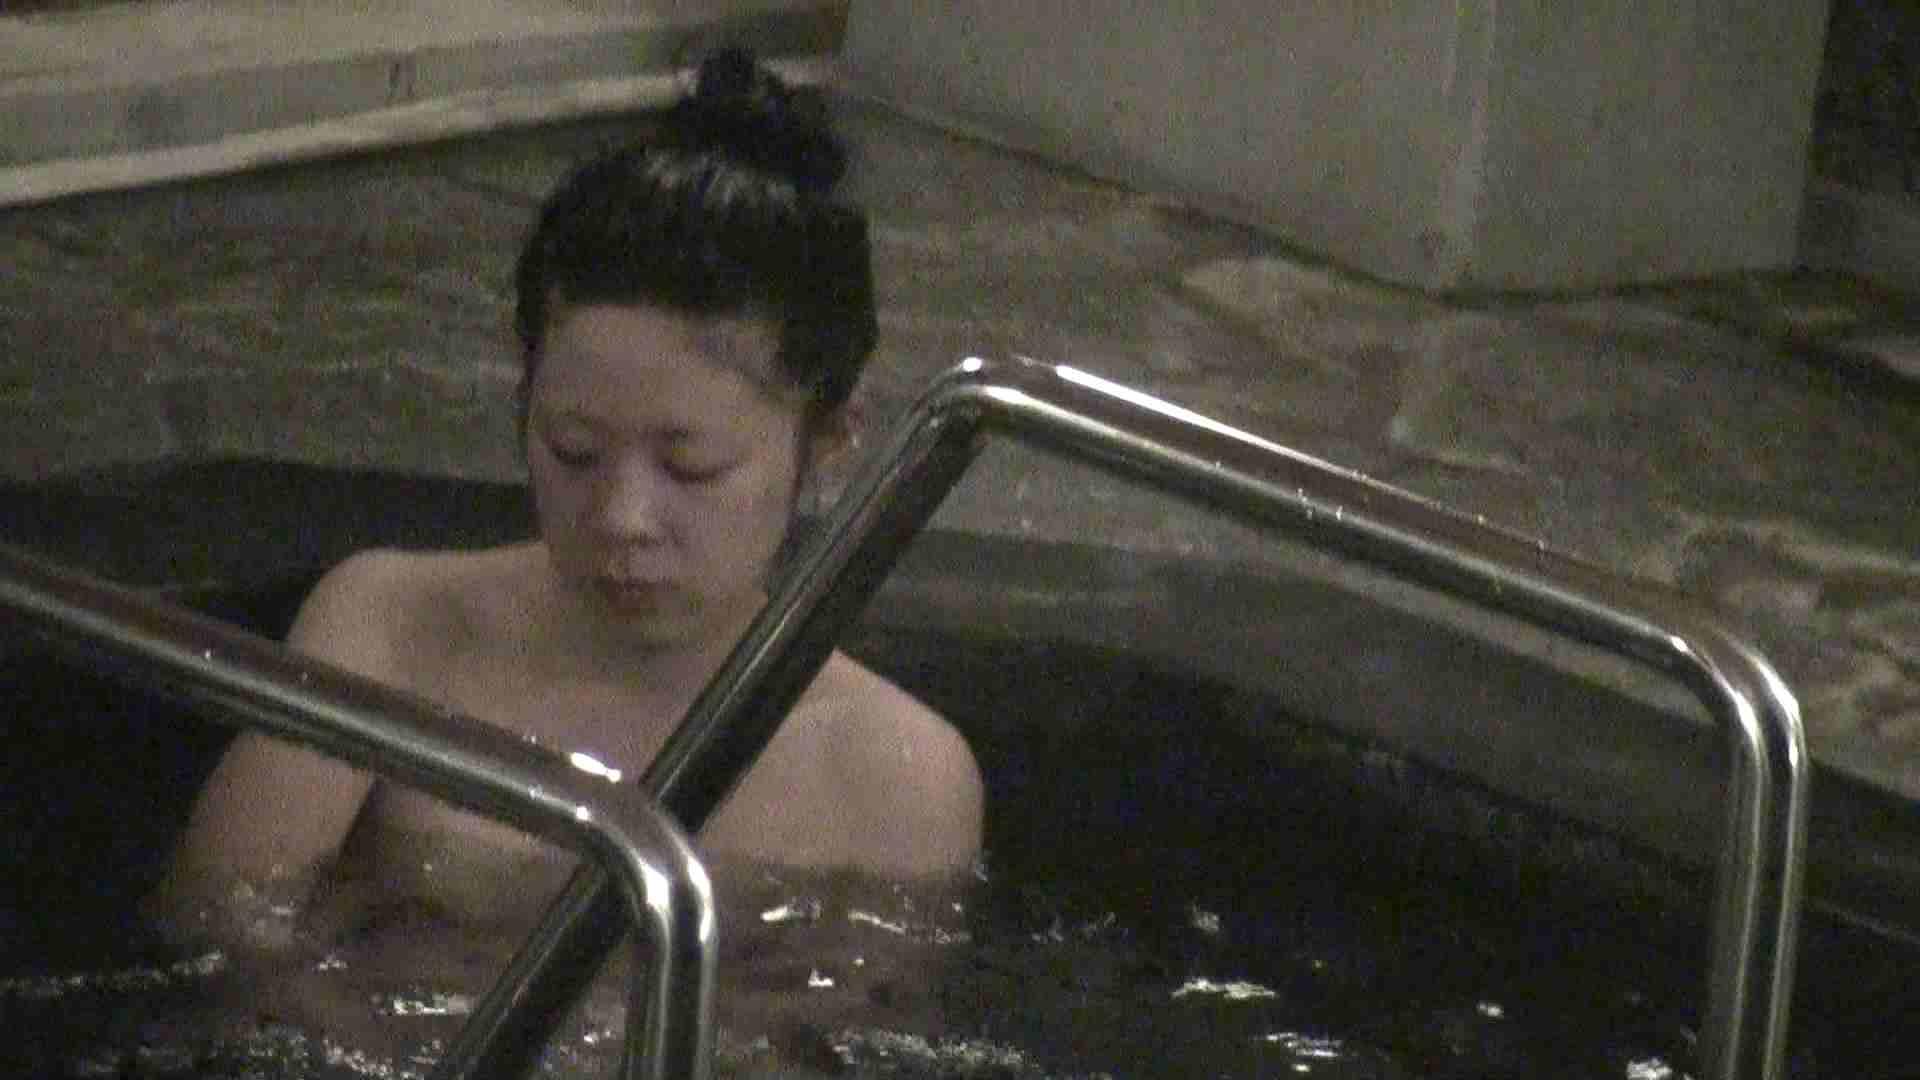 Aquaな露天風呂Vol.314 盗撮師作品  86pic 51